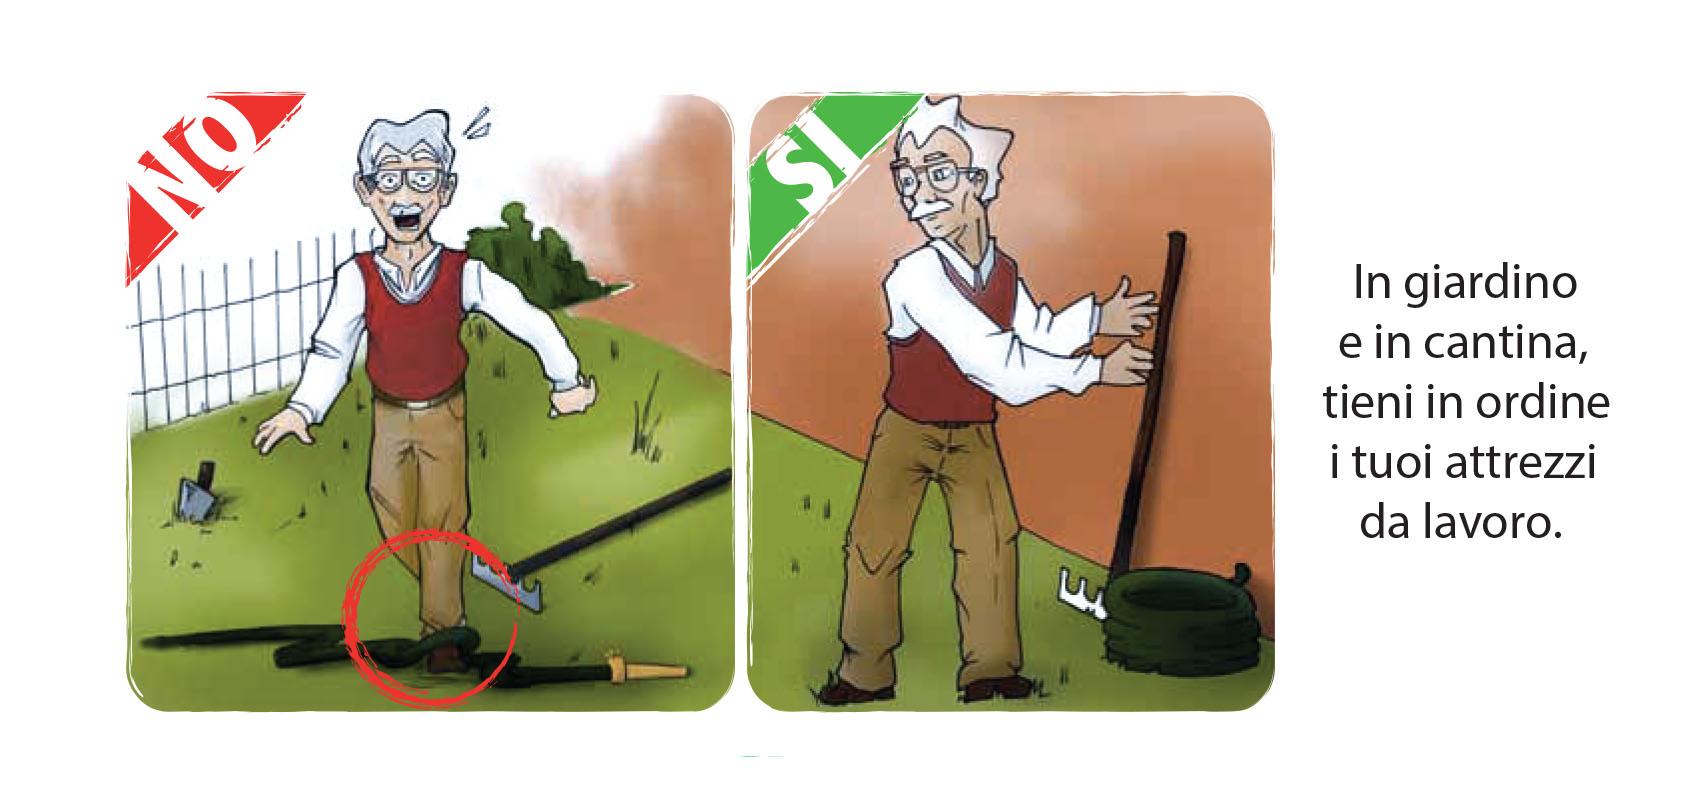 anziani-pighevole-giardino